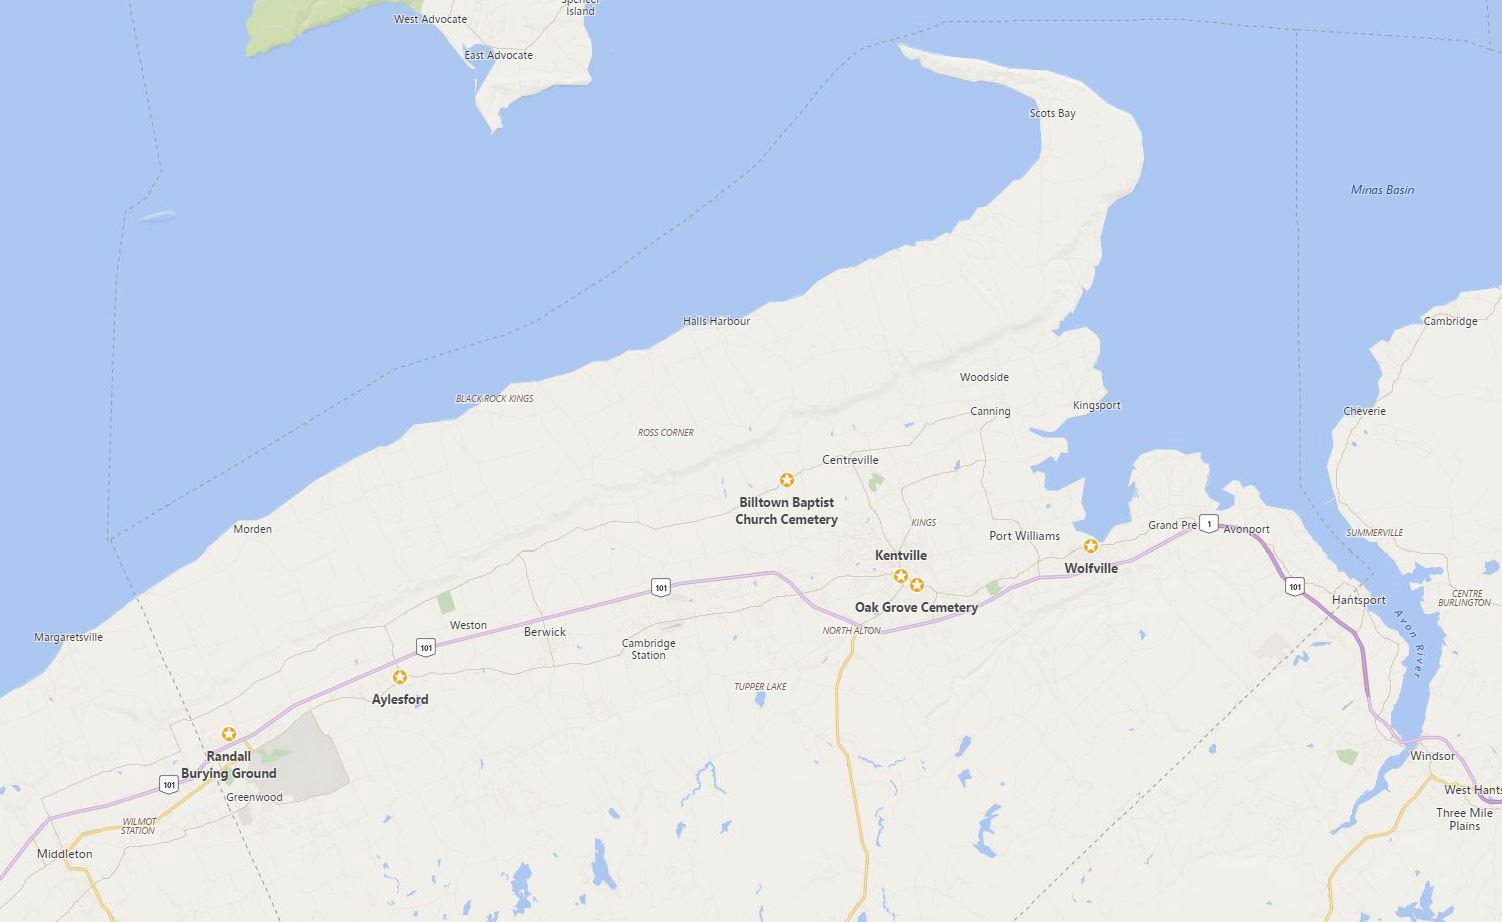 Kings County Map showing Perkins Landmarks